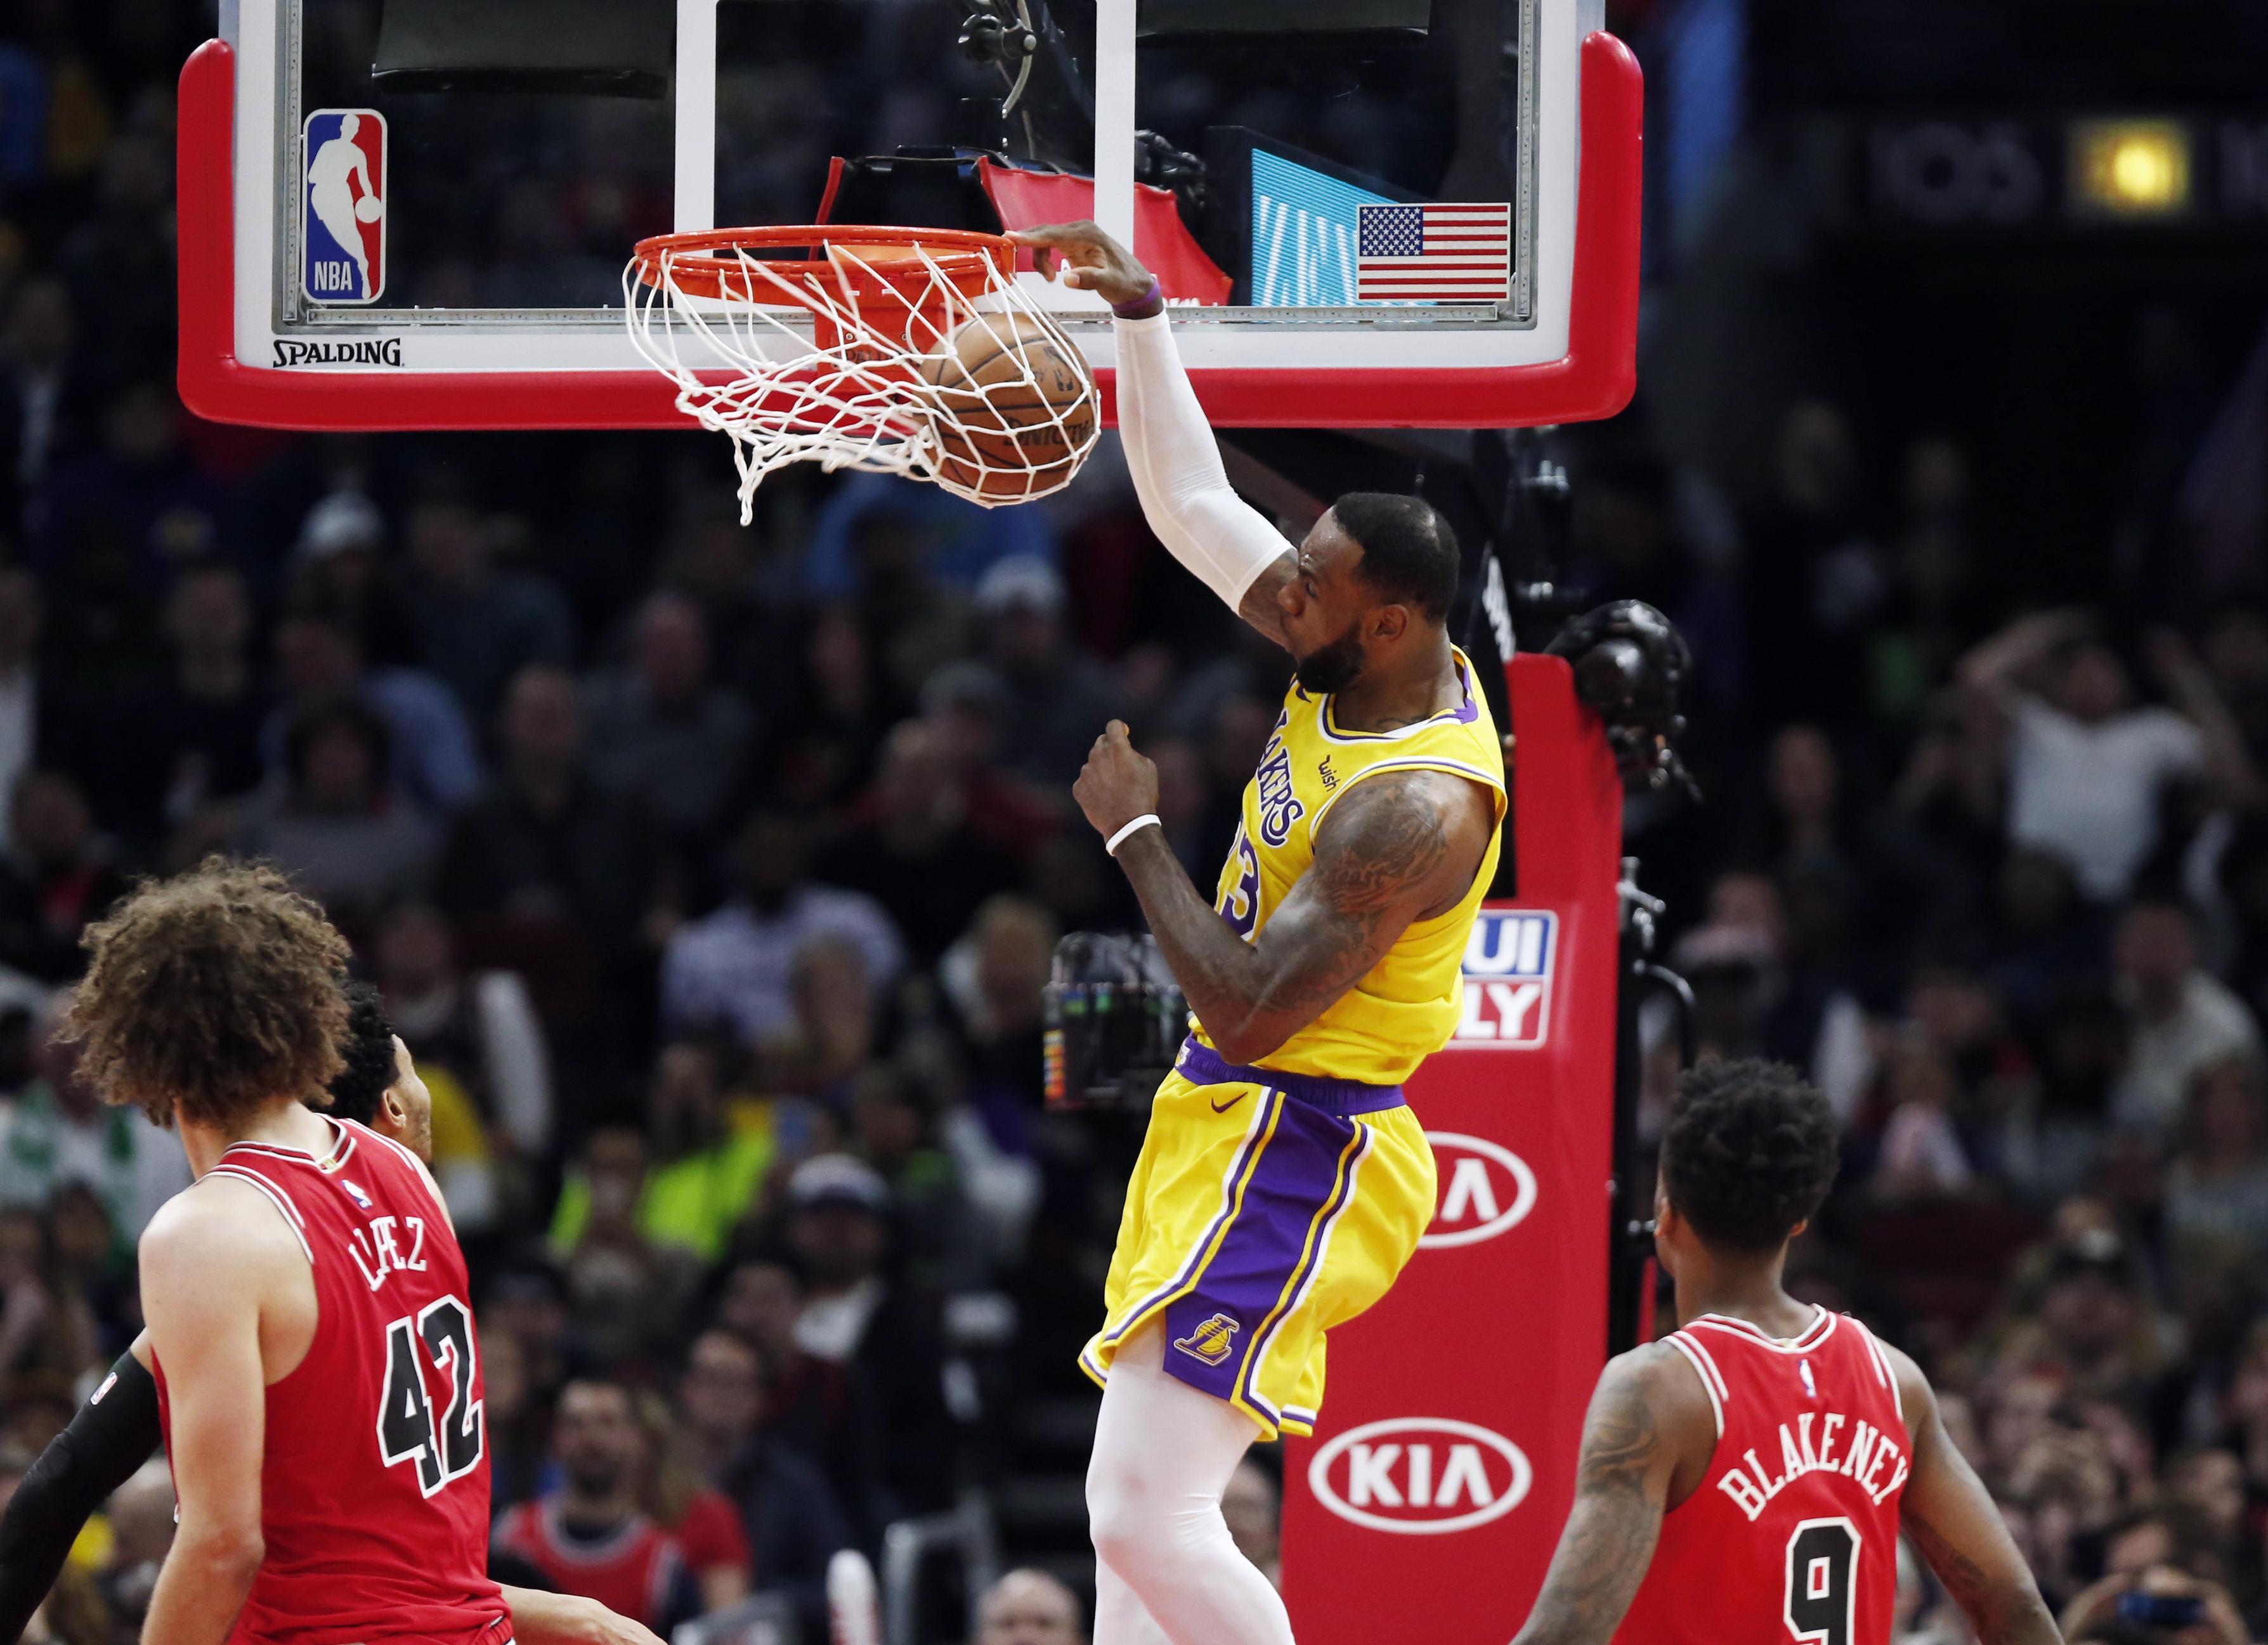 He99 Lebron James Dunk Nba Sports Art Basketball: NBA Roundup: LeBron James Scores 36, Lakers End 5-game